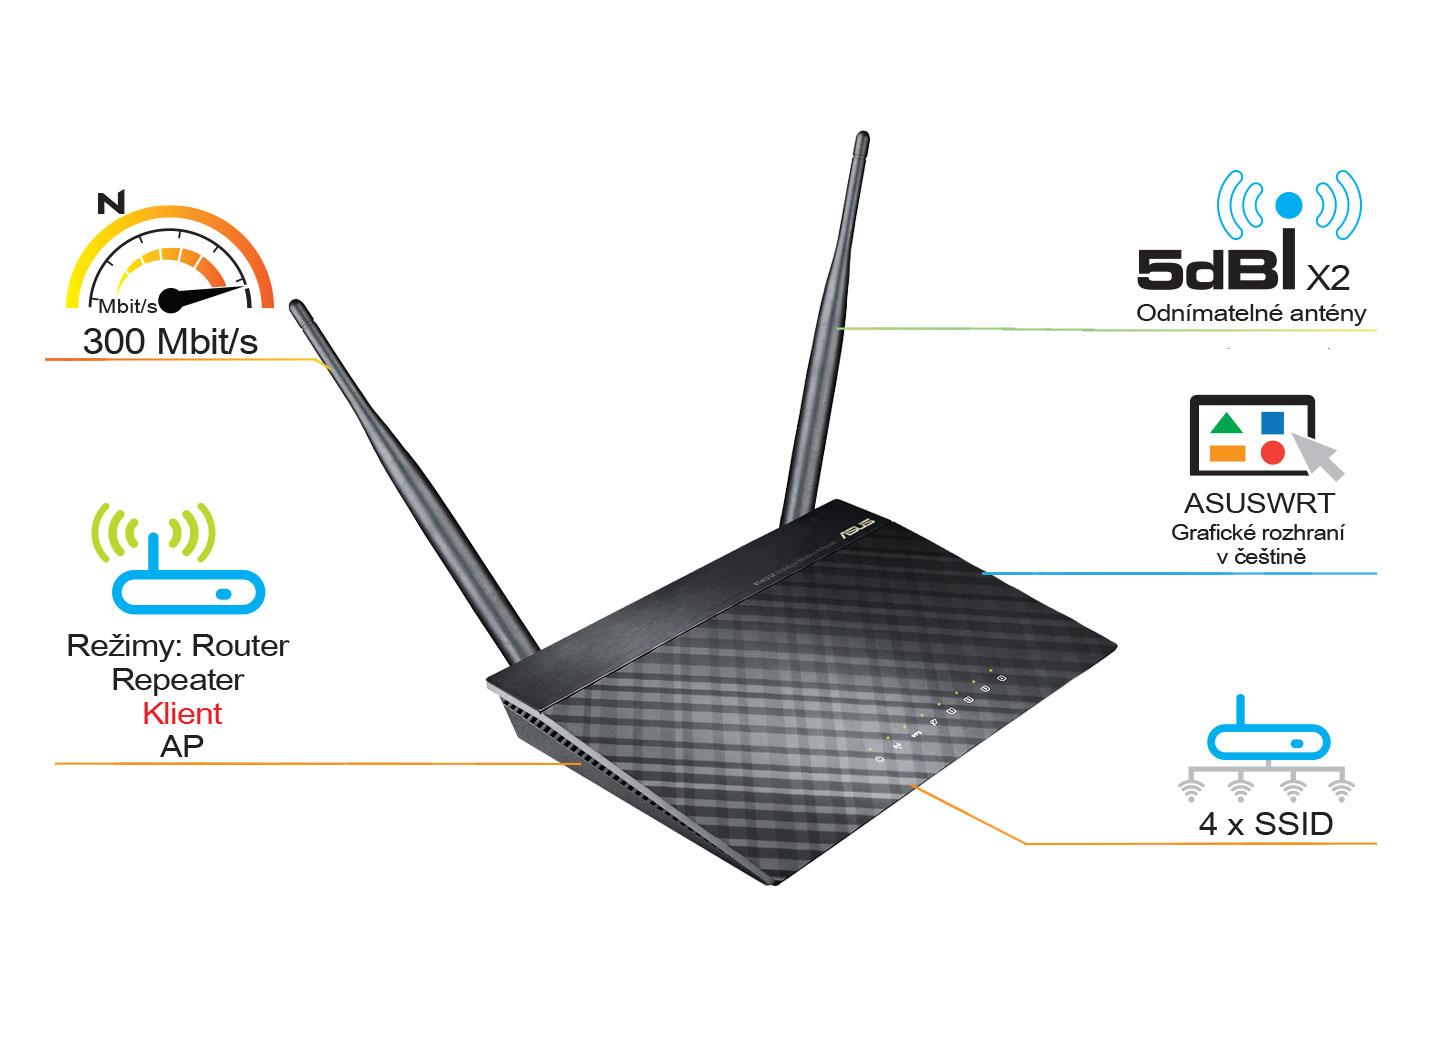 ASUS wifi router RT-N12K